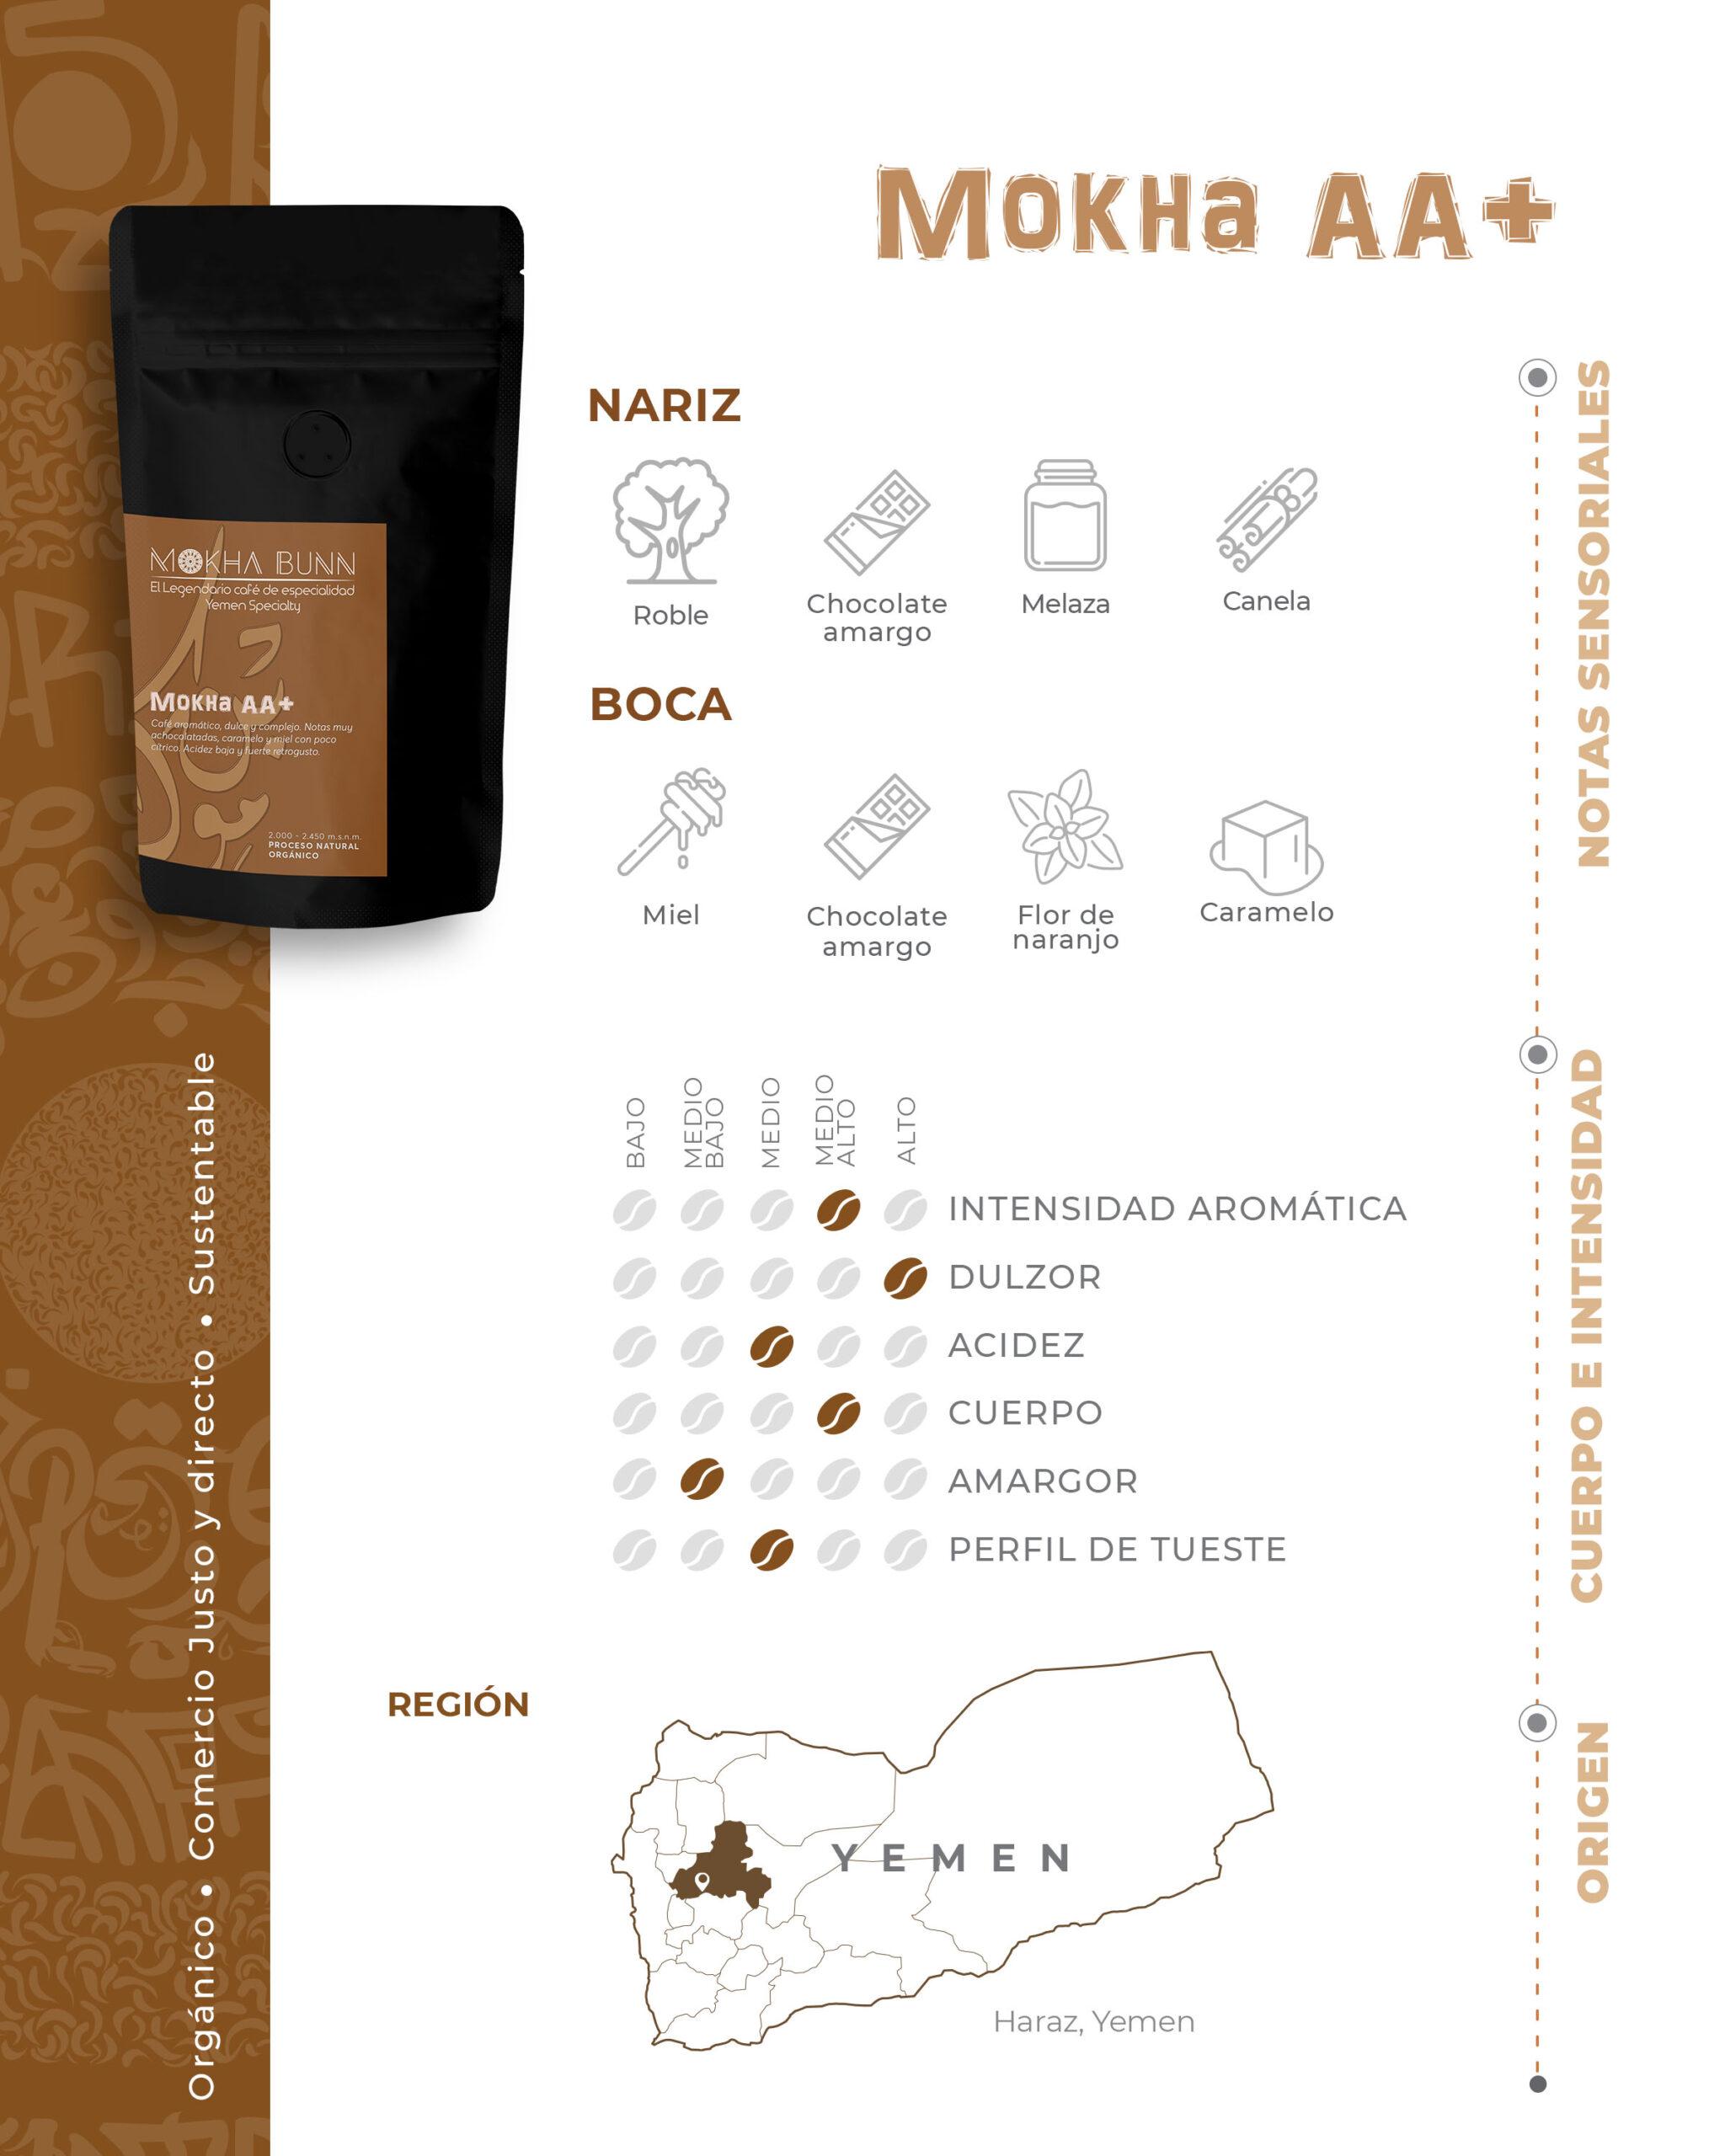 MOKHA aa Café De Especialidad De Yemen Mokha Bunn